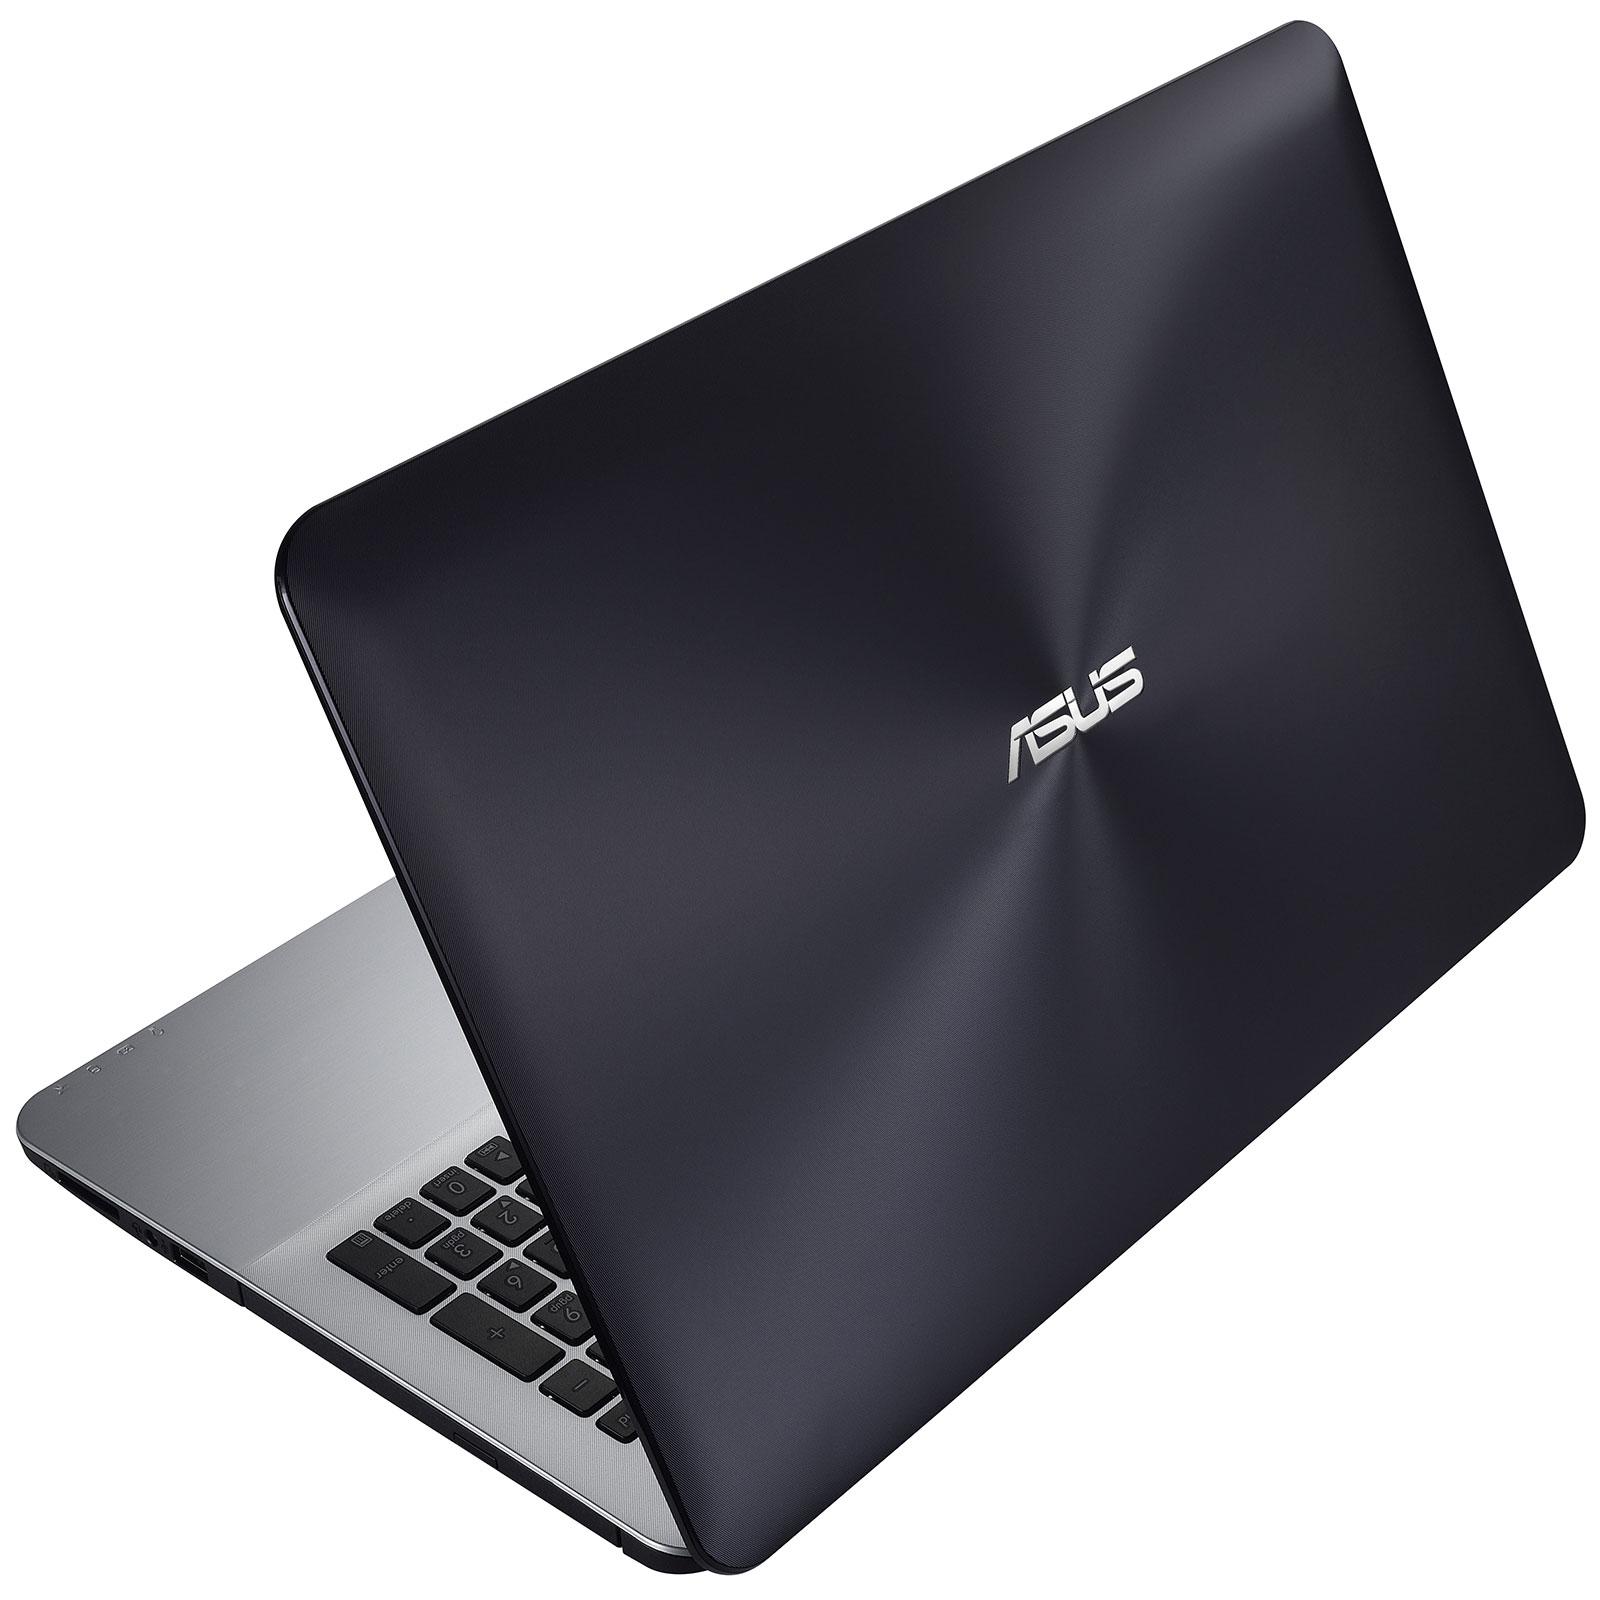 "ASUS R556UJ-DM191T 2.3GHz i5-6200U 15.6"" 1920 x 1080Pixel Nero, Grigio Computer portatile notebook/portatile"